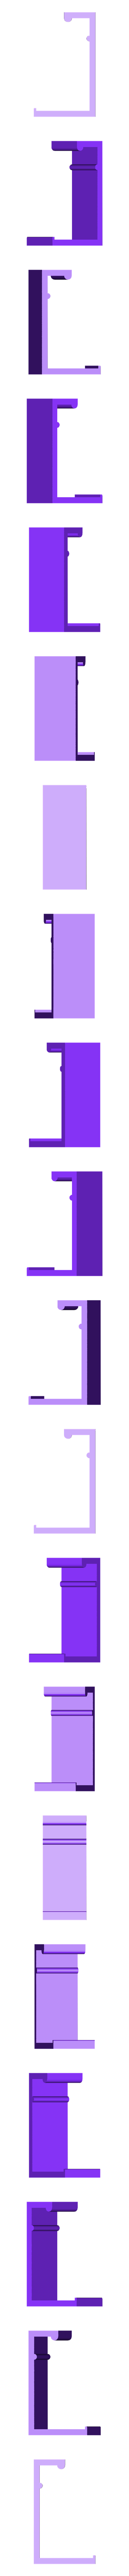 ClipCartucho.stl Download free STL file Clip para cartucho HP664 • 3D printing object, linoresende